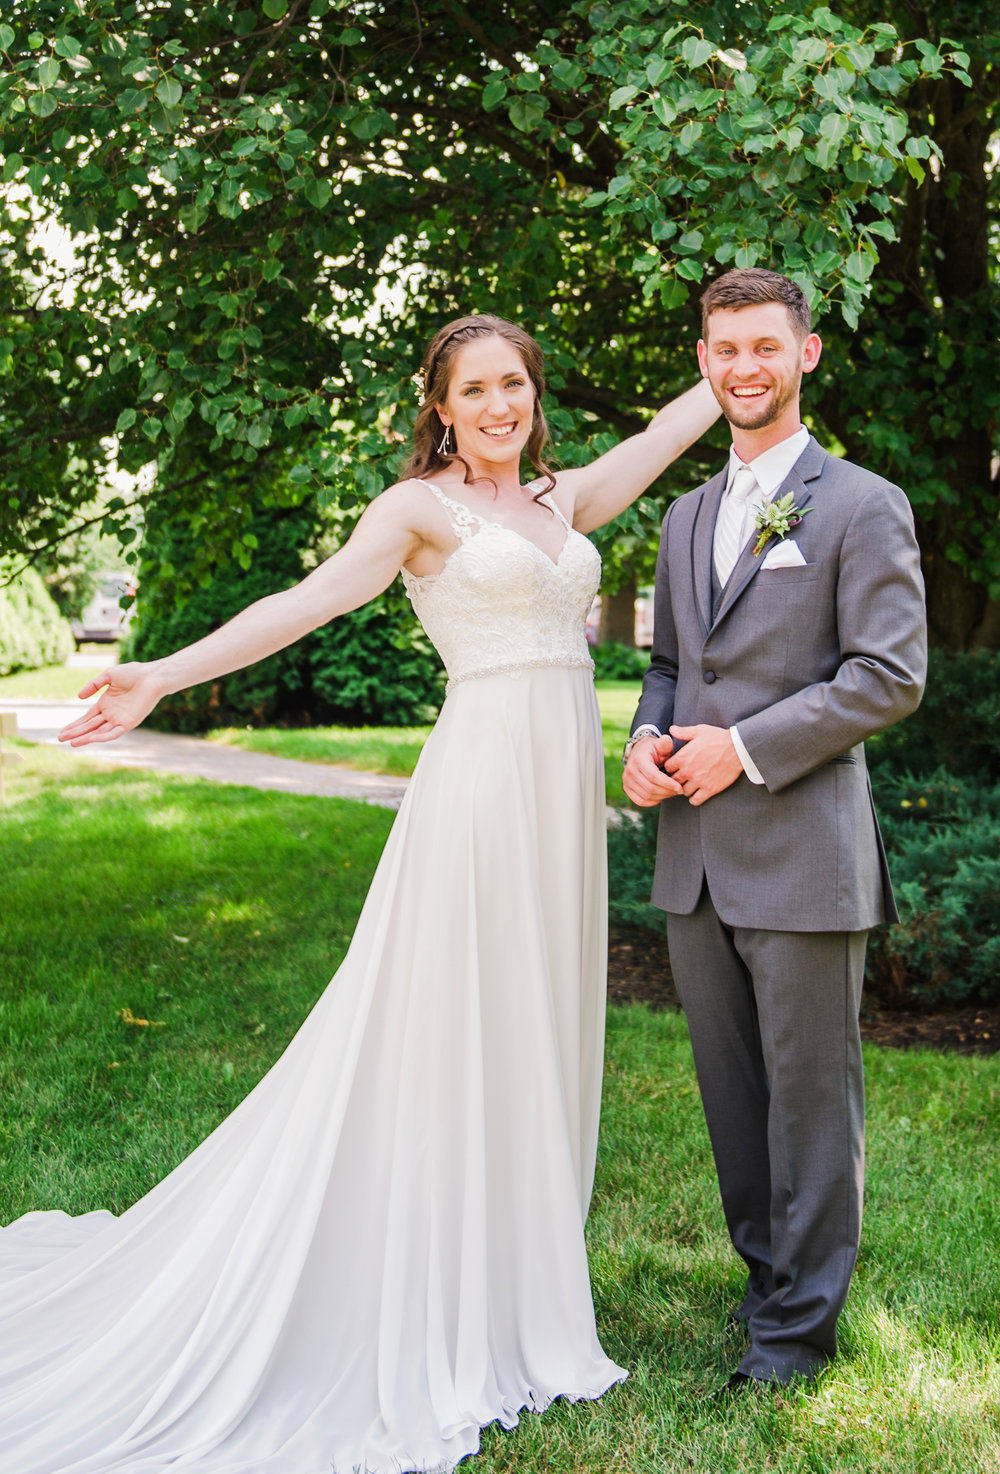 Jerris_Wadsworth_Wedding_Barn_Rochester_Wedding_JILL_STUDIO_Rochester_NY_Photographer_DSC_2284.jpg